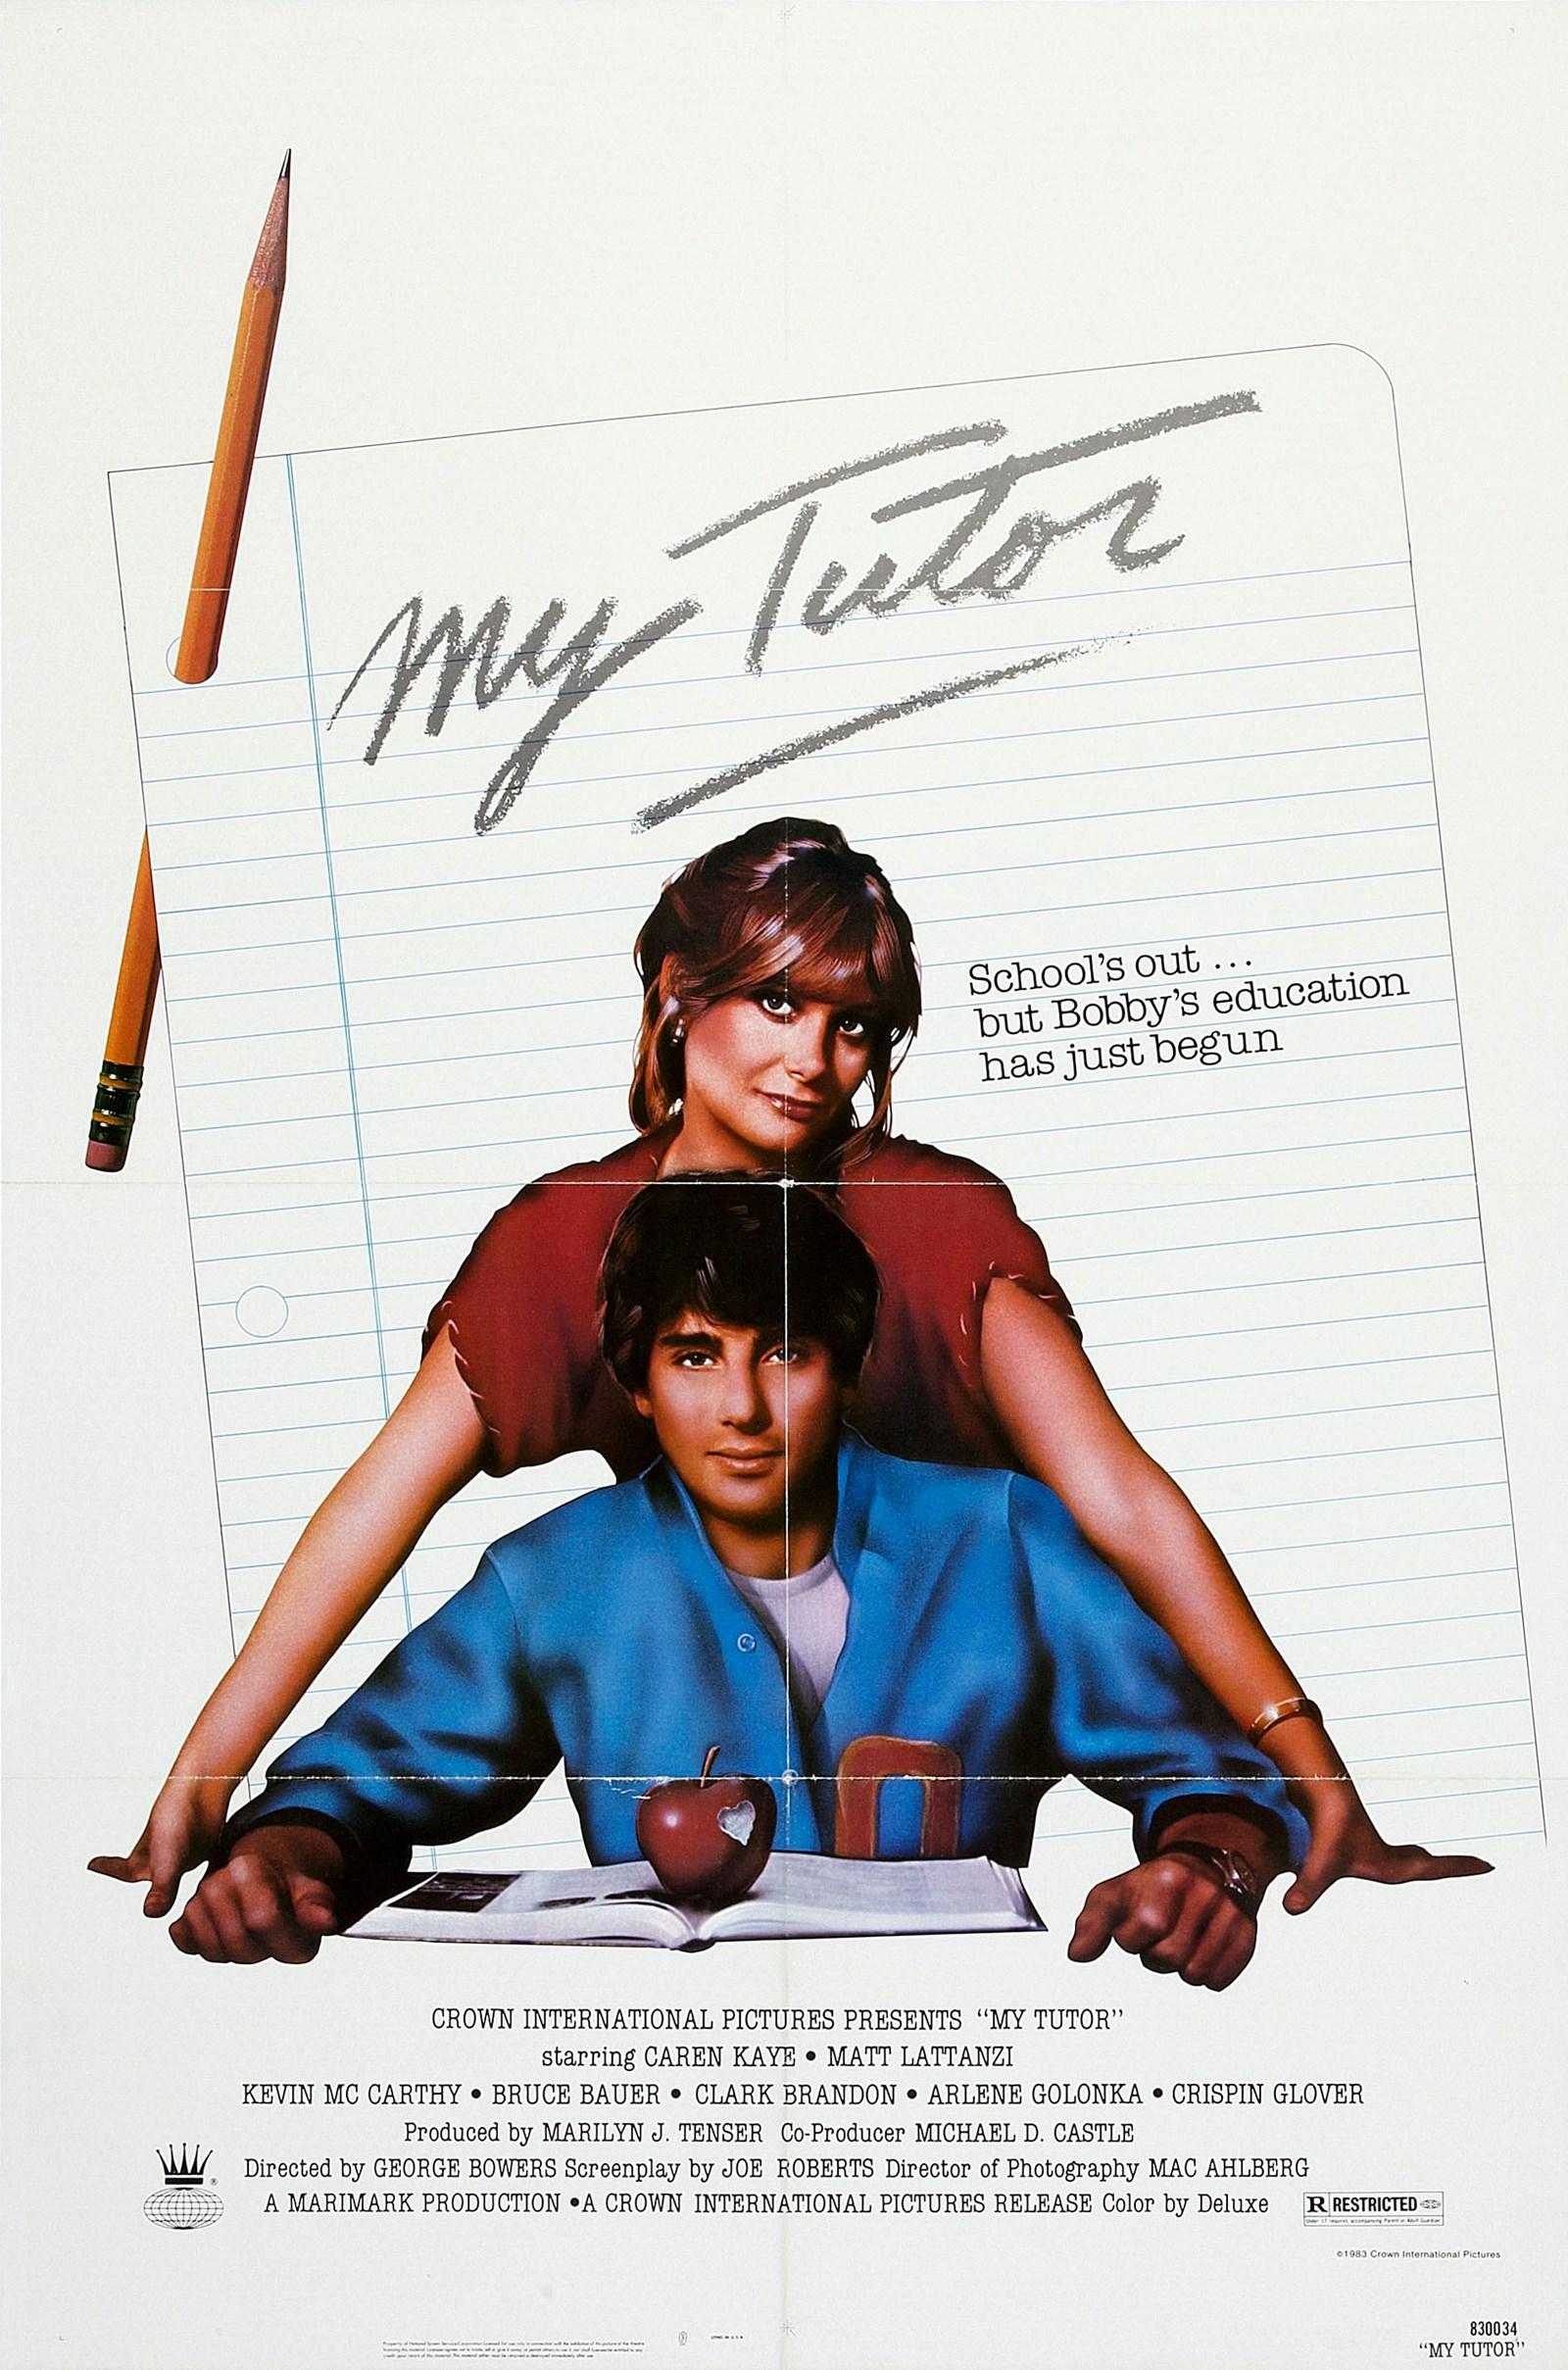 Caren kaye my tutor 1983 young boy and milf - 5 1